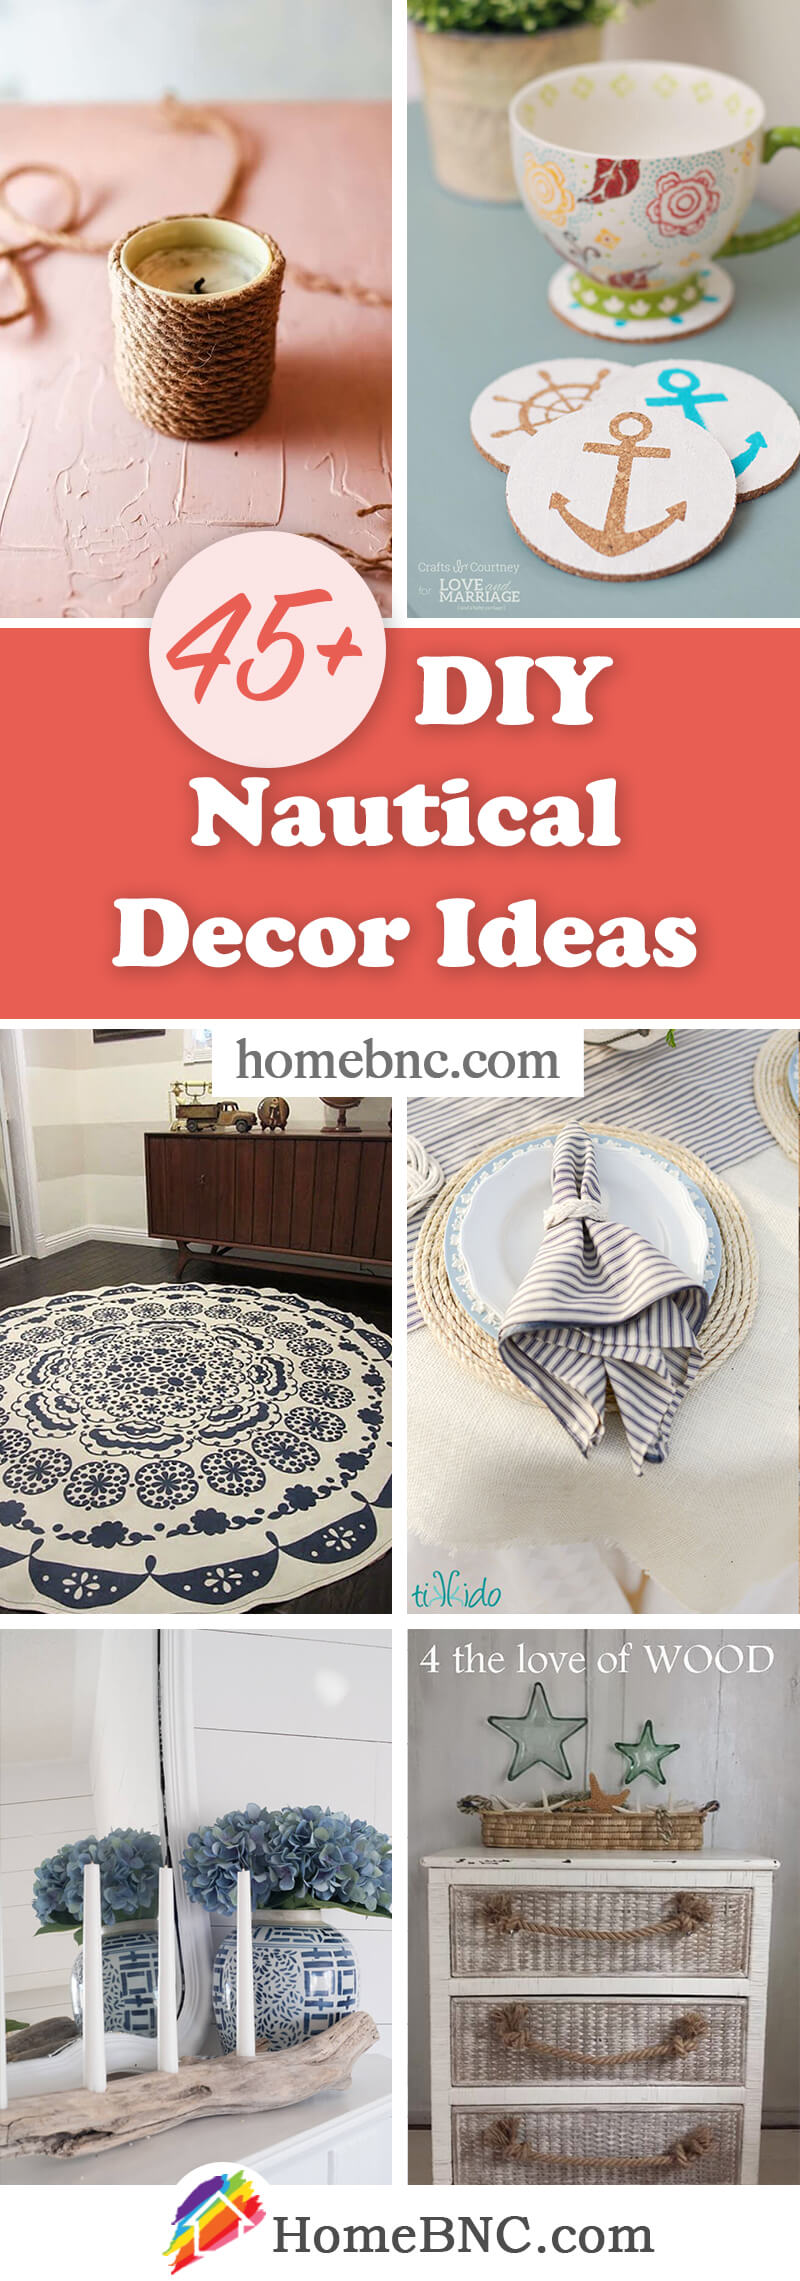 Cheap DIY Nautical Decorations